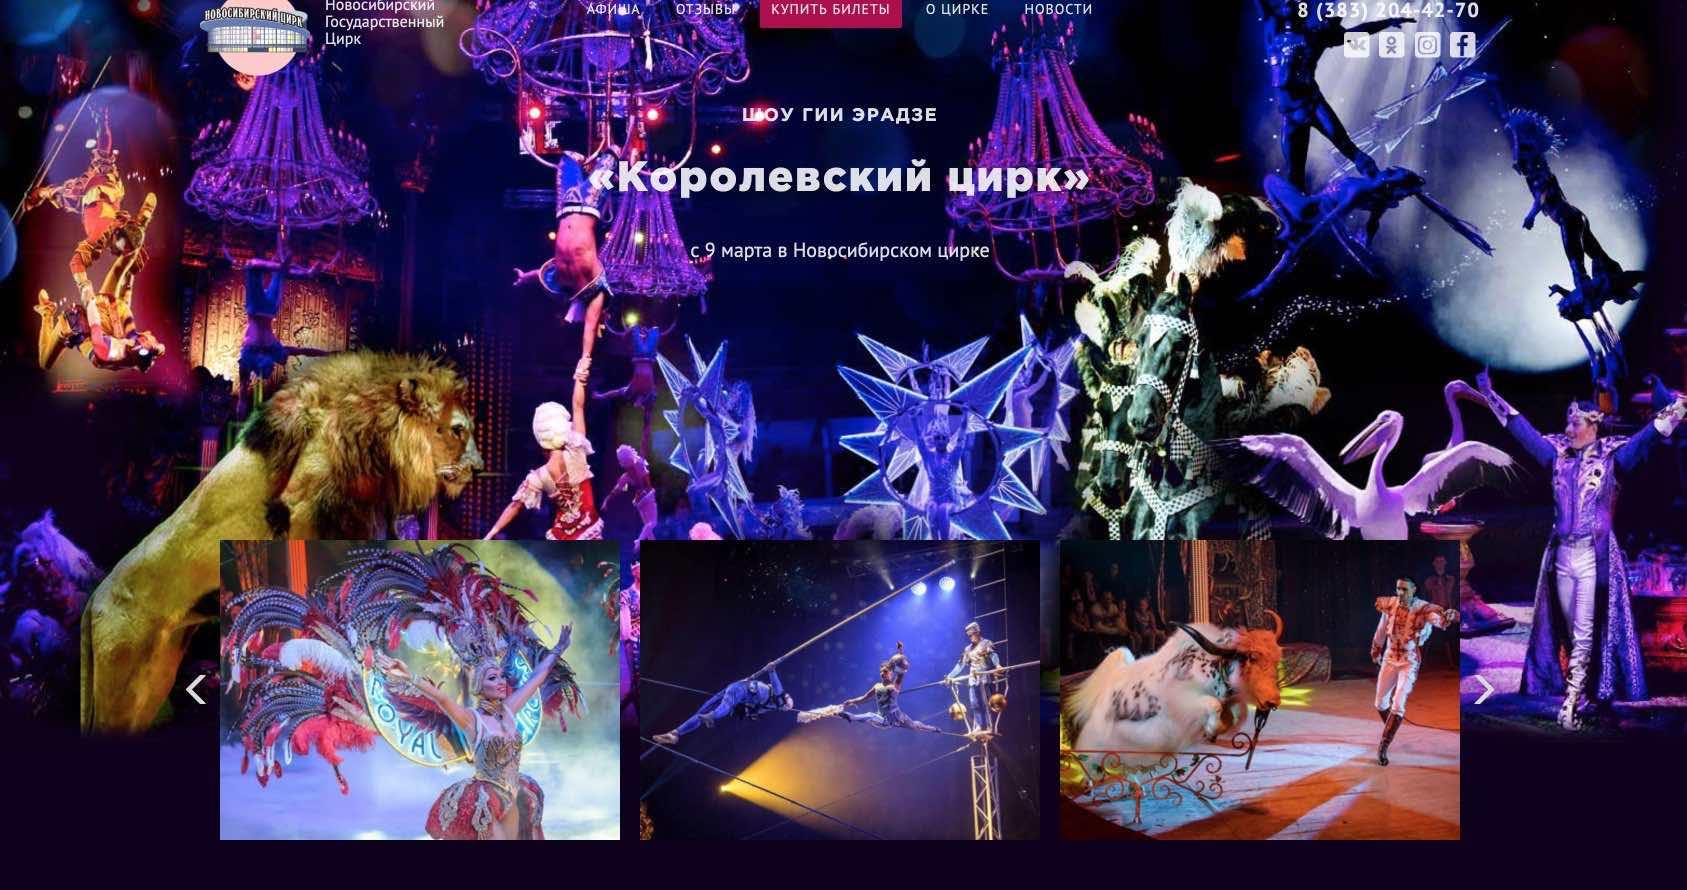 Novosibirsk State Circus